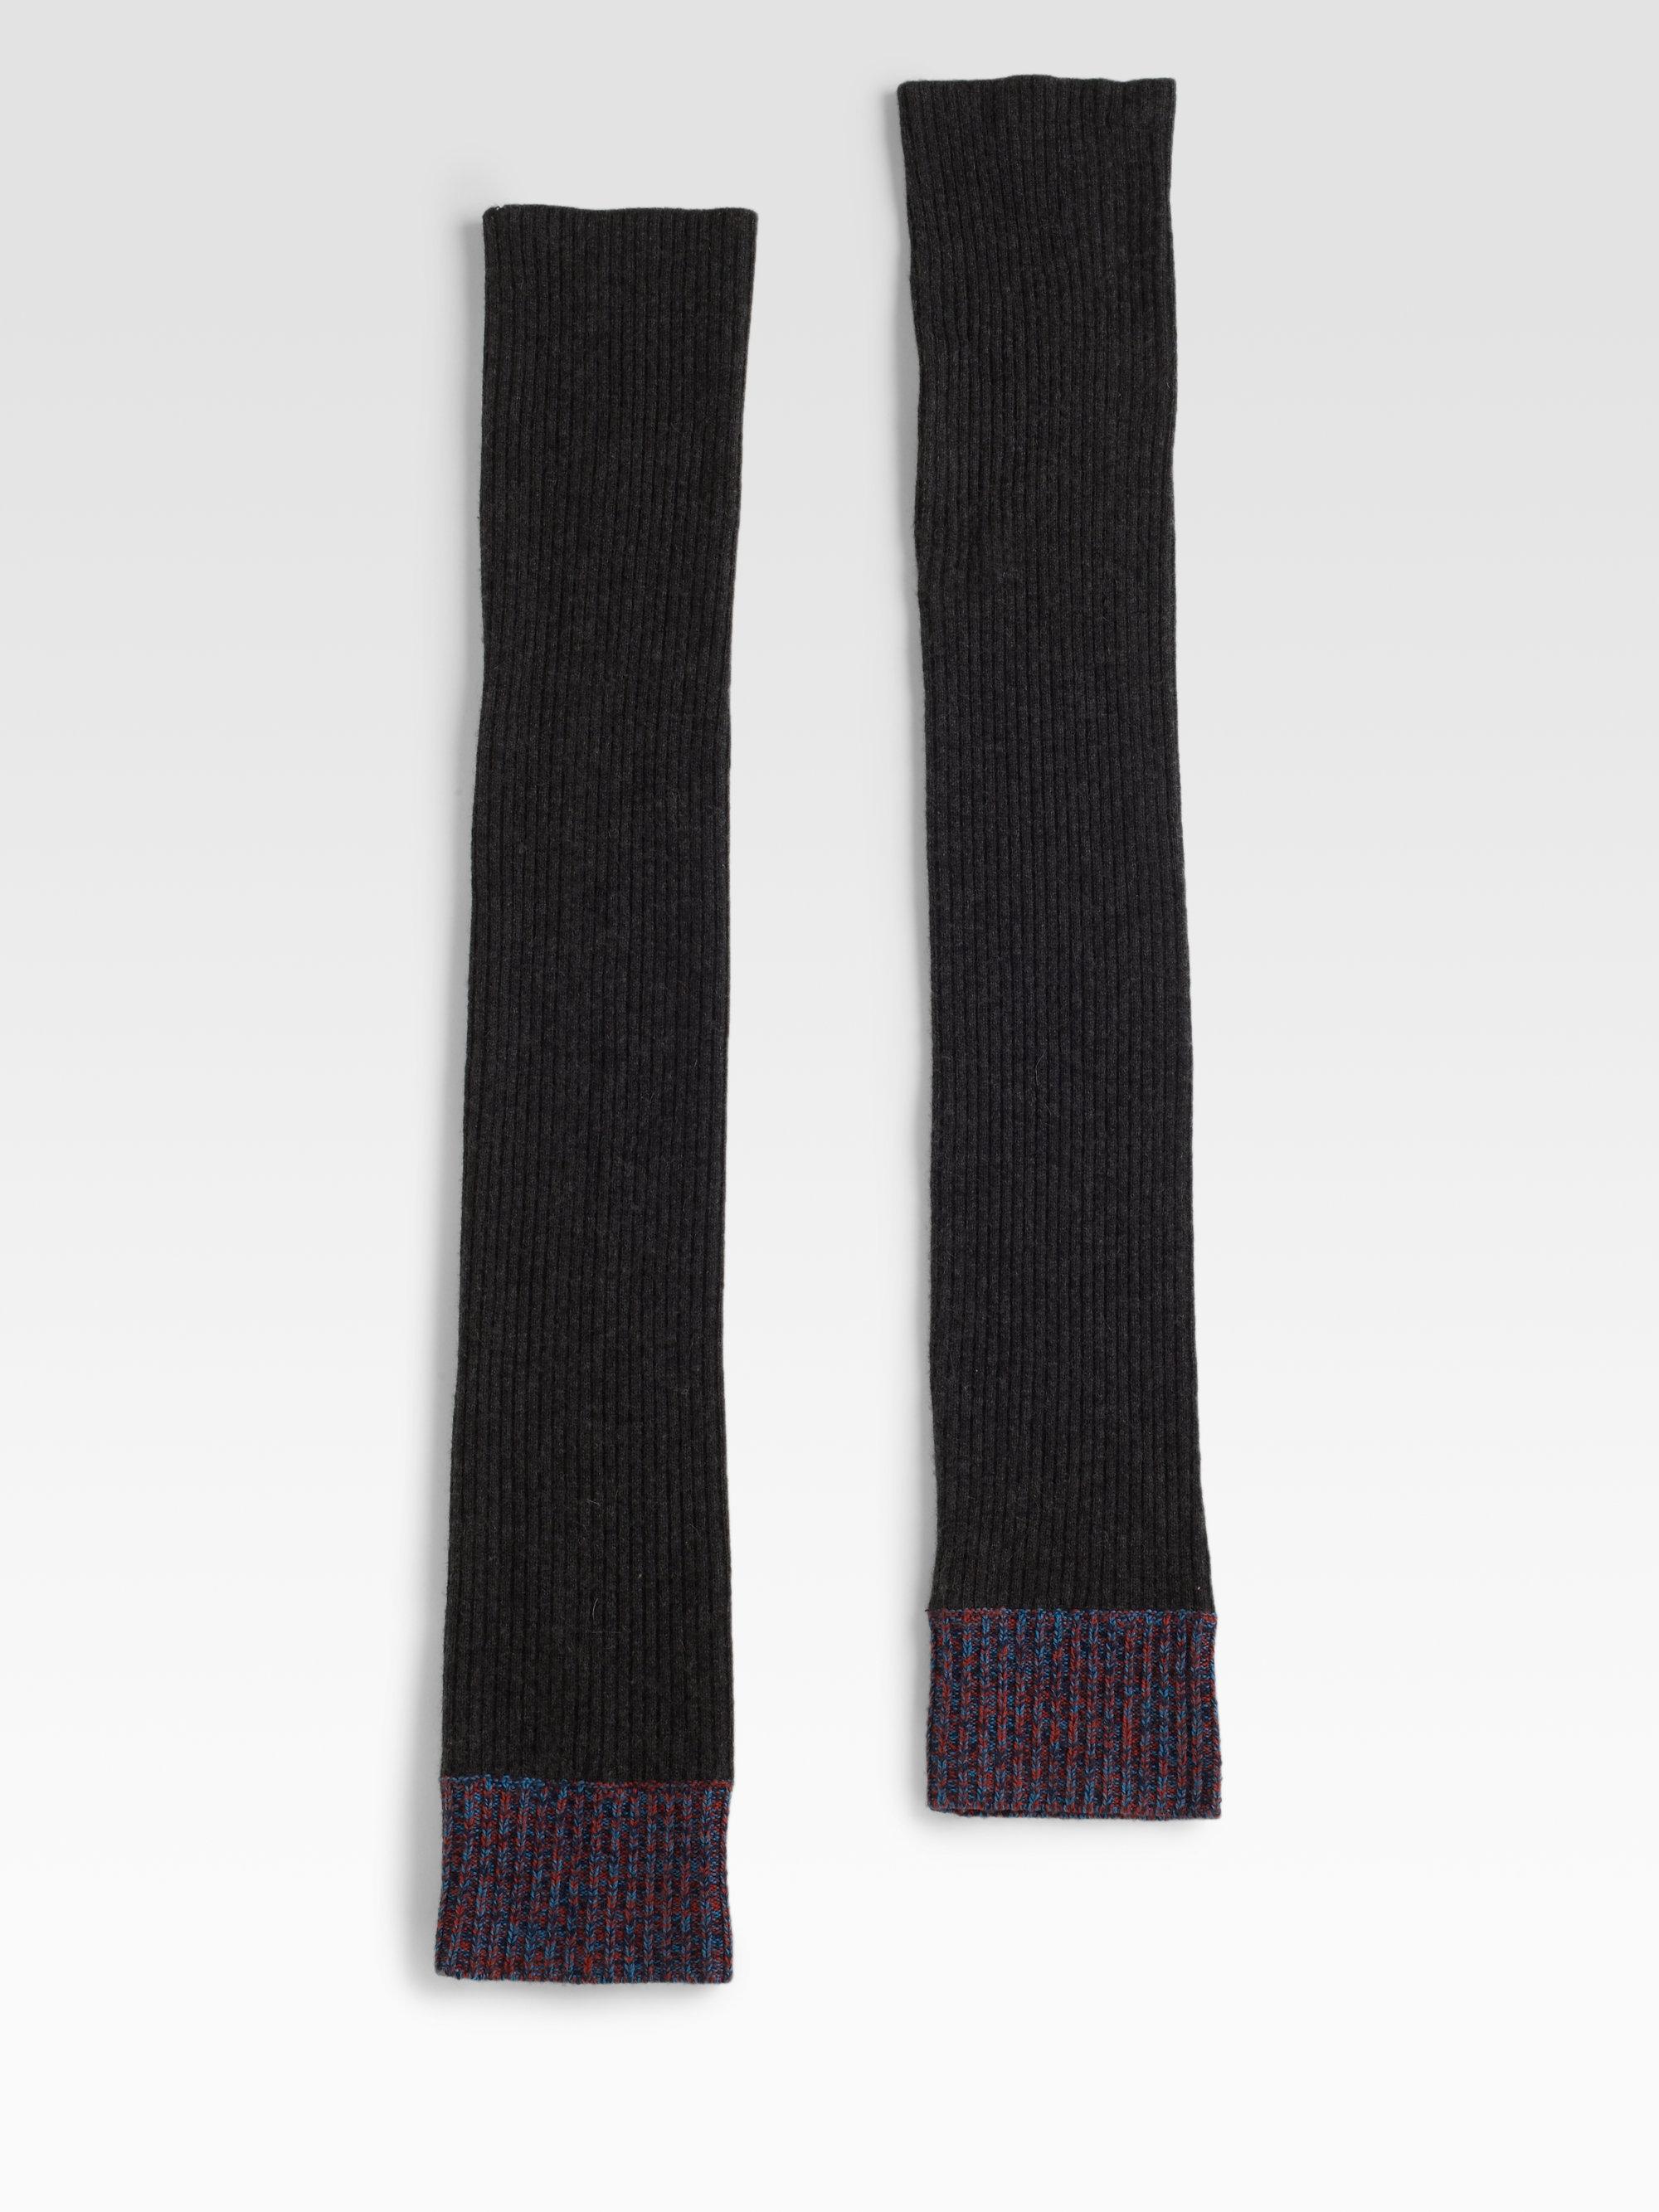 Rag & Bone Shoreditch Leg Warmers In Dark Charcoal (Black